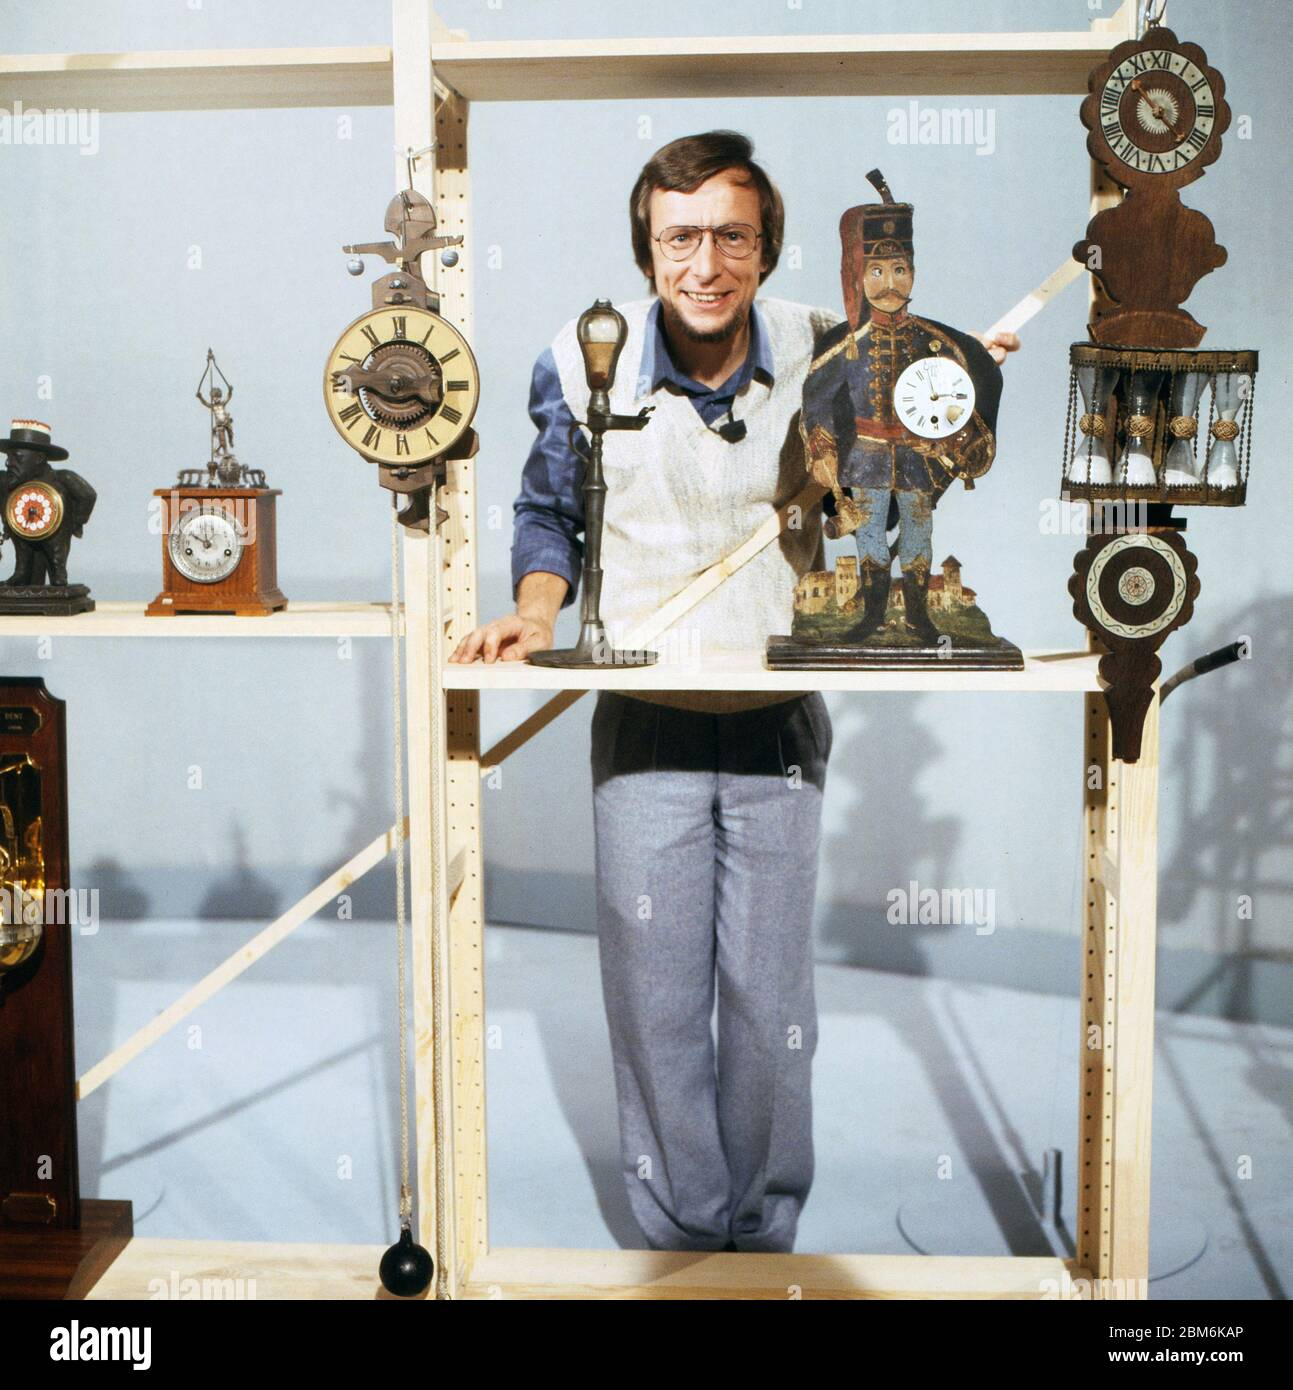 Technik für Kinder, Fernsehserie, Deutschland 1975 - 1980, Folge: Wie kann man Zeit messen, modérateur: Volker Arzt Banque D'Images